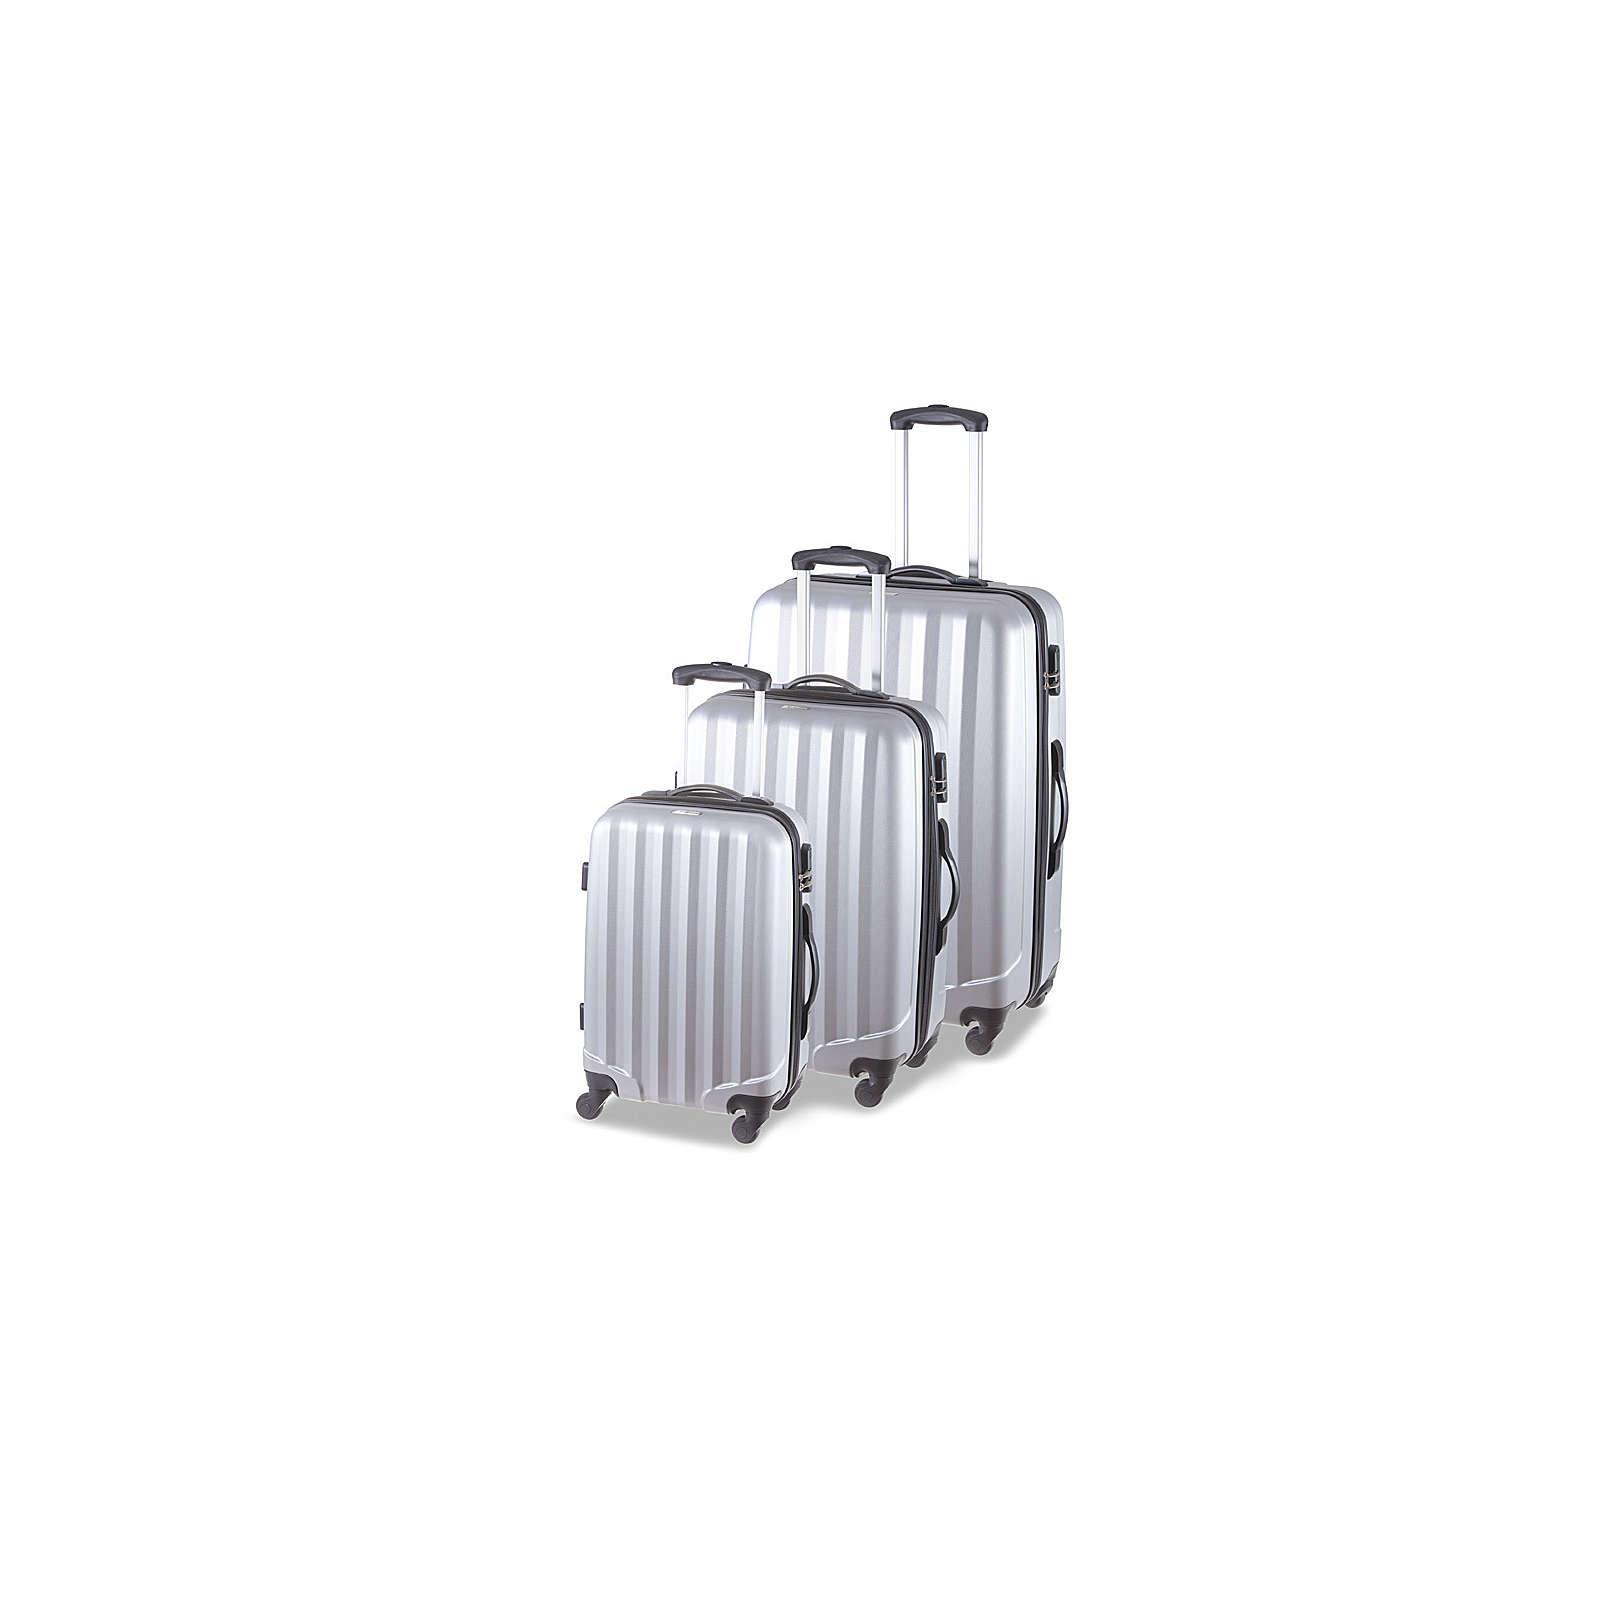 SCHNEIDERS Koffer Set Manhattan Koffer silber